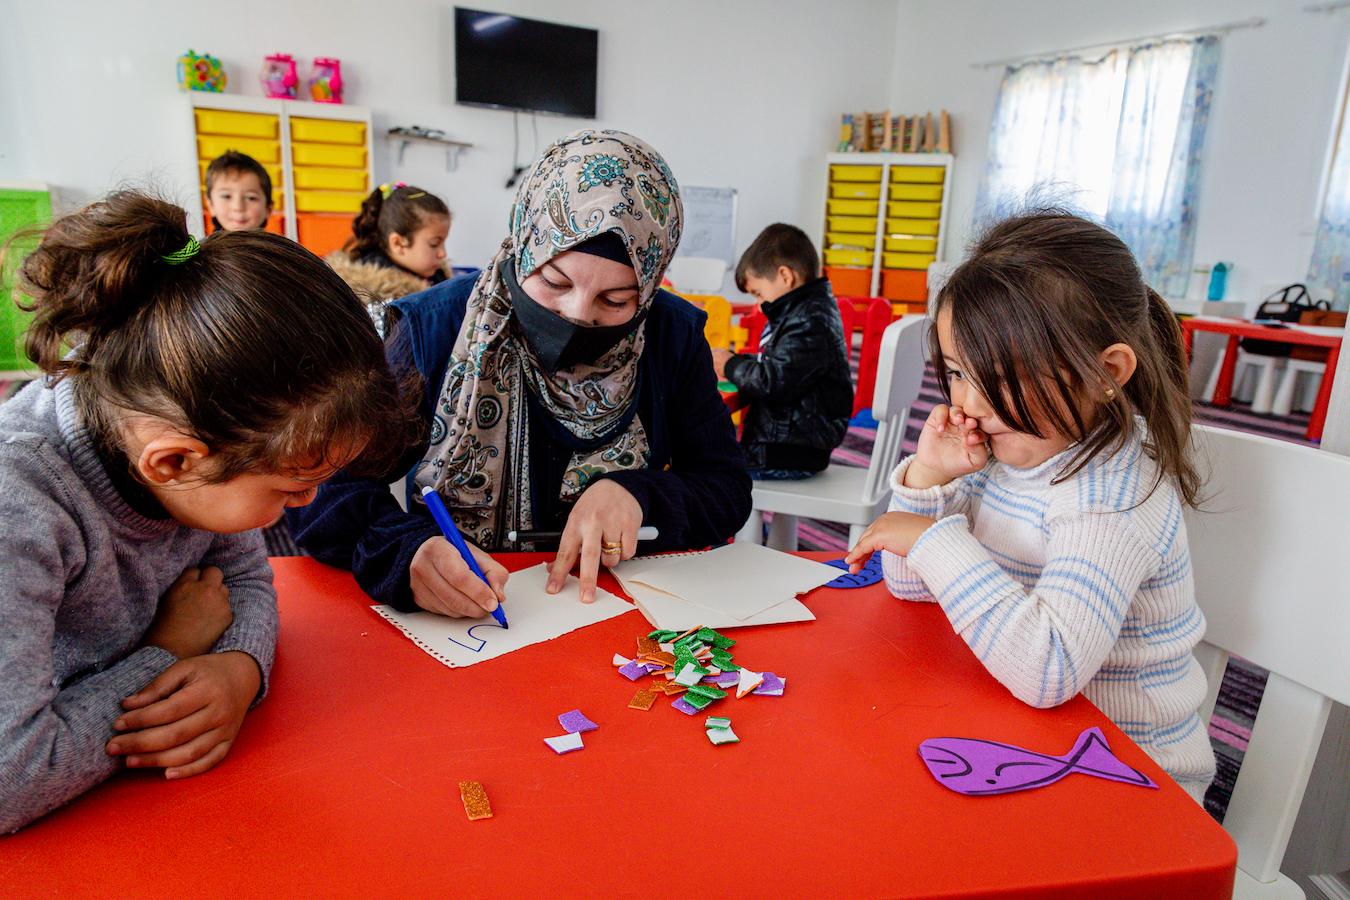 Suzan-teaching-ECD-Azraq-Camp-center-children-Arabic-letters-and-her-daughter-Sham-next-to-her-2.jpg